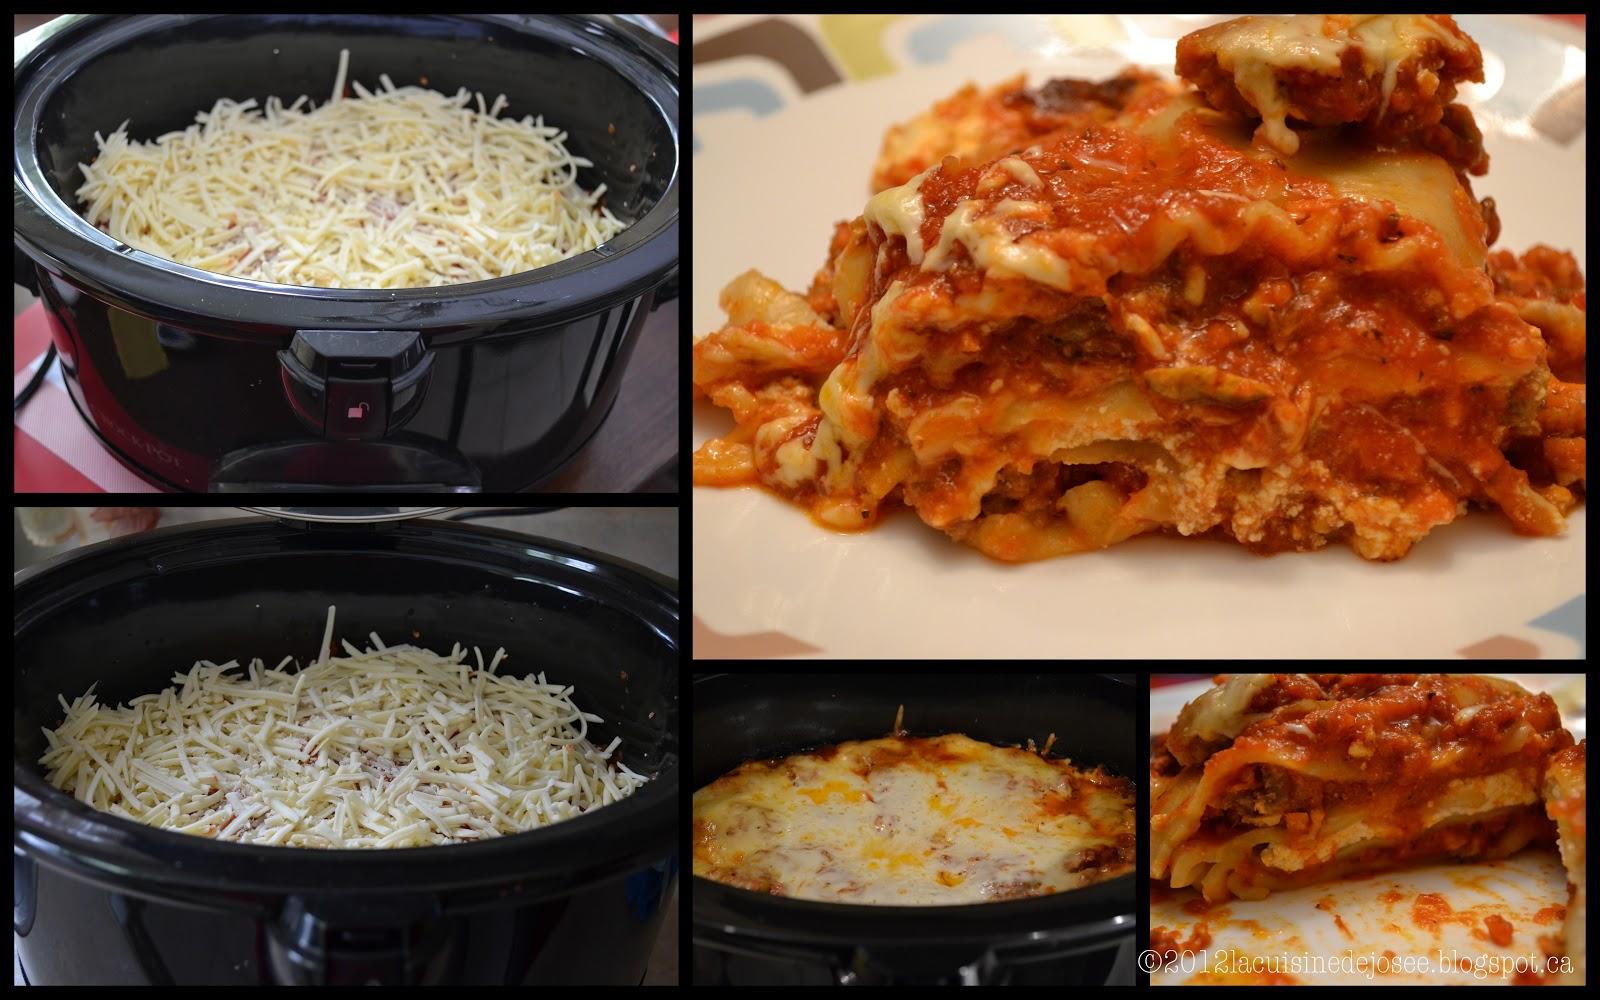 La cuisine de jos e lasagne la mijoteuse ricardo - Ricardo cuisine mijoteuse ...